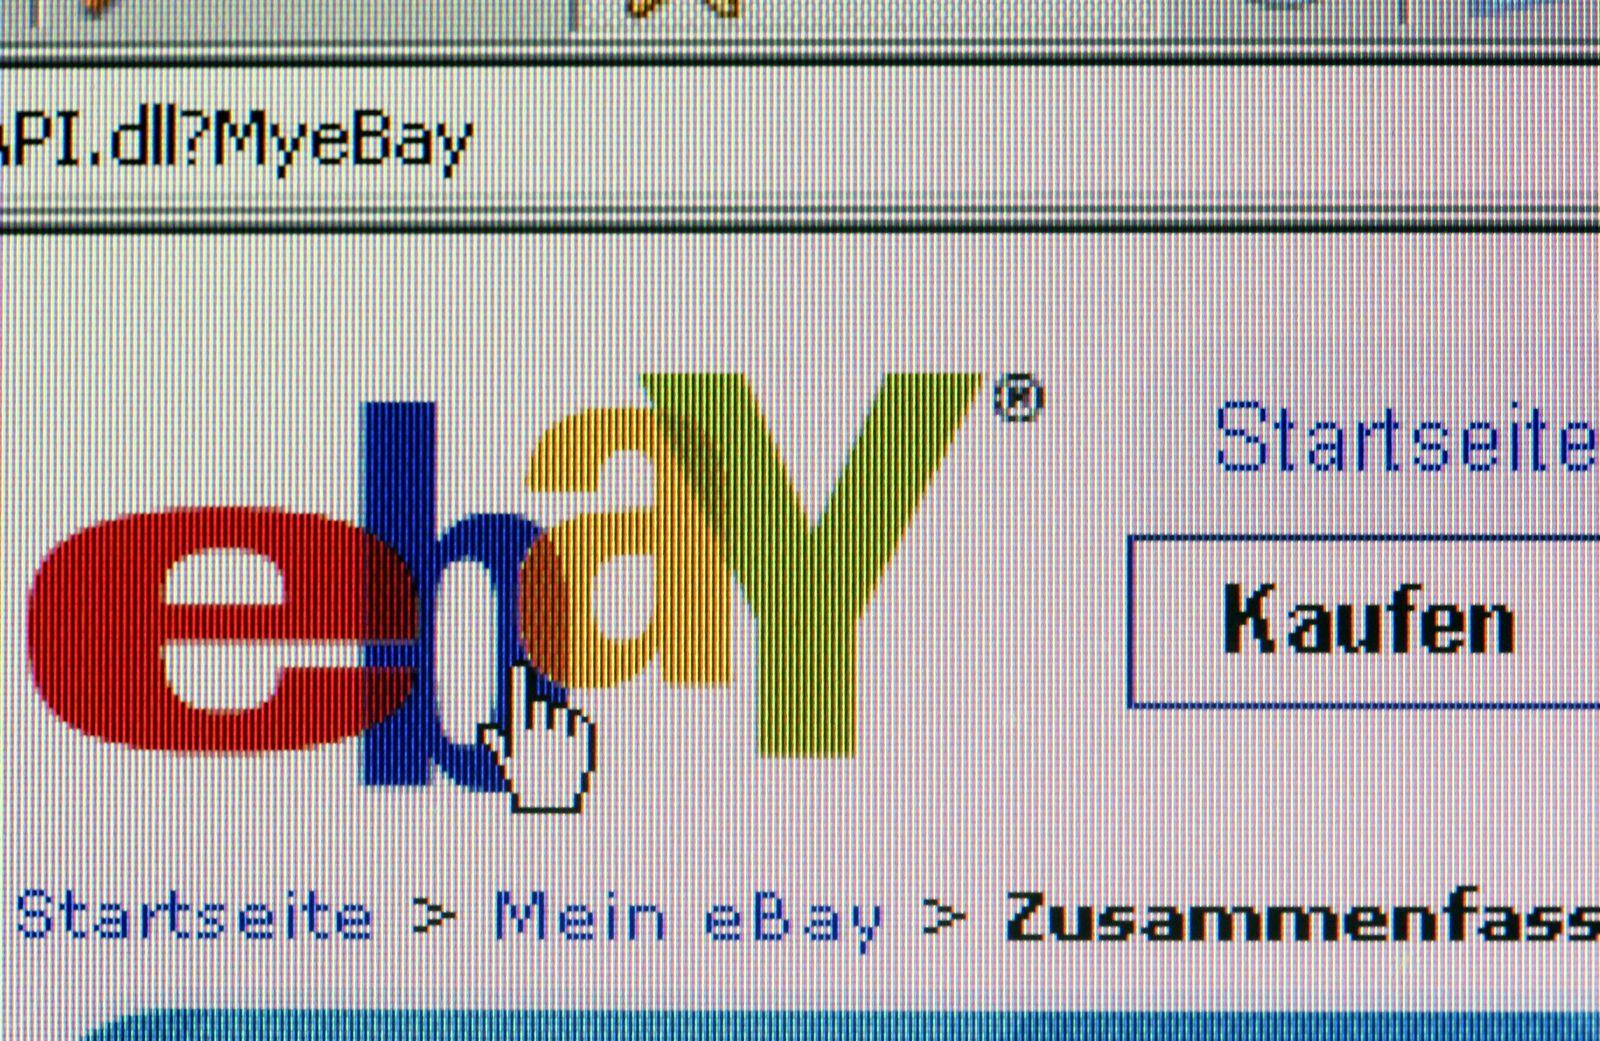 Internet-Auktionshaus ebay